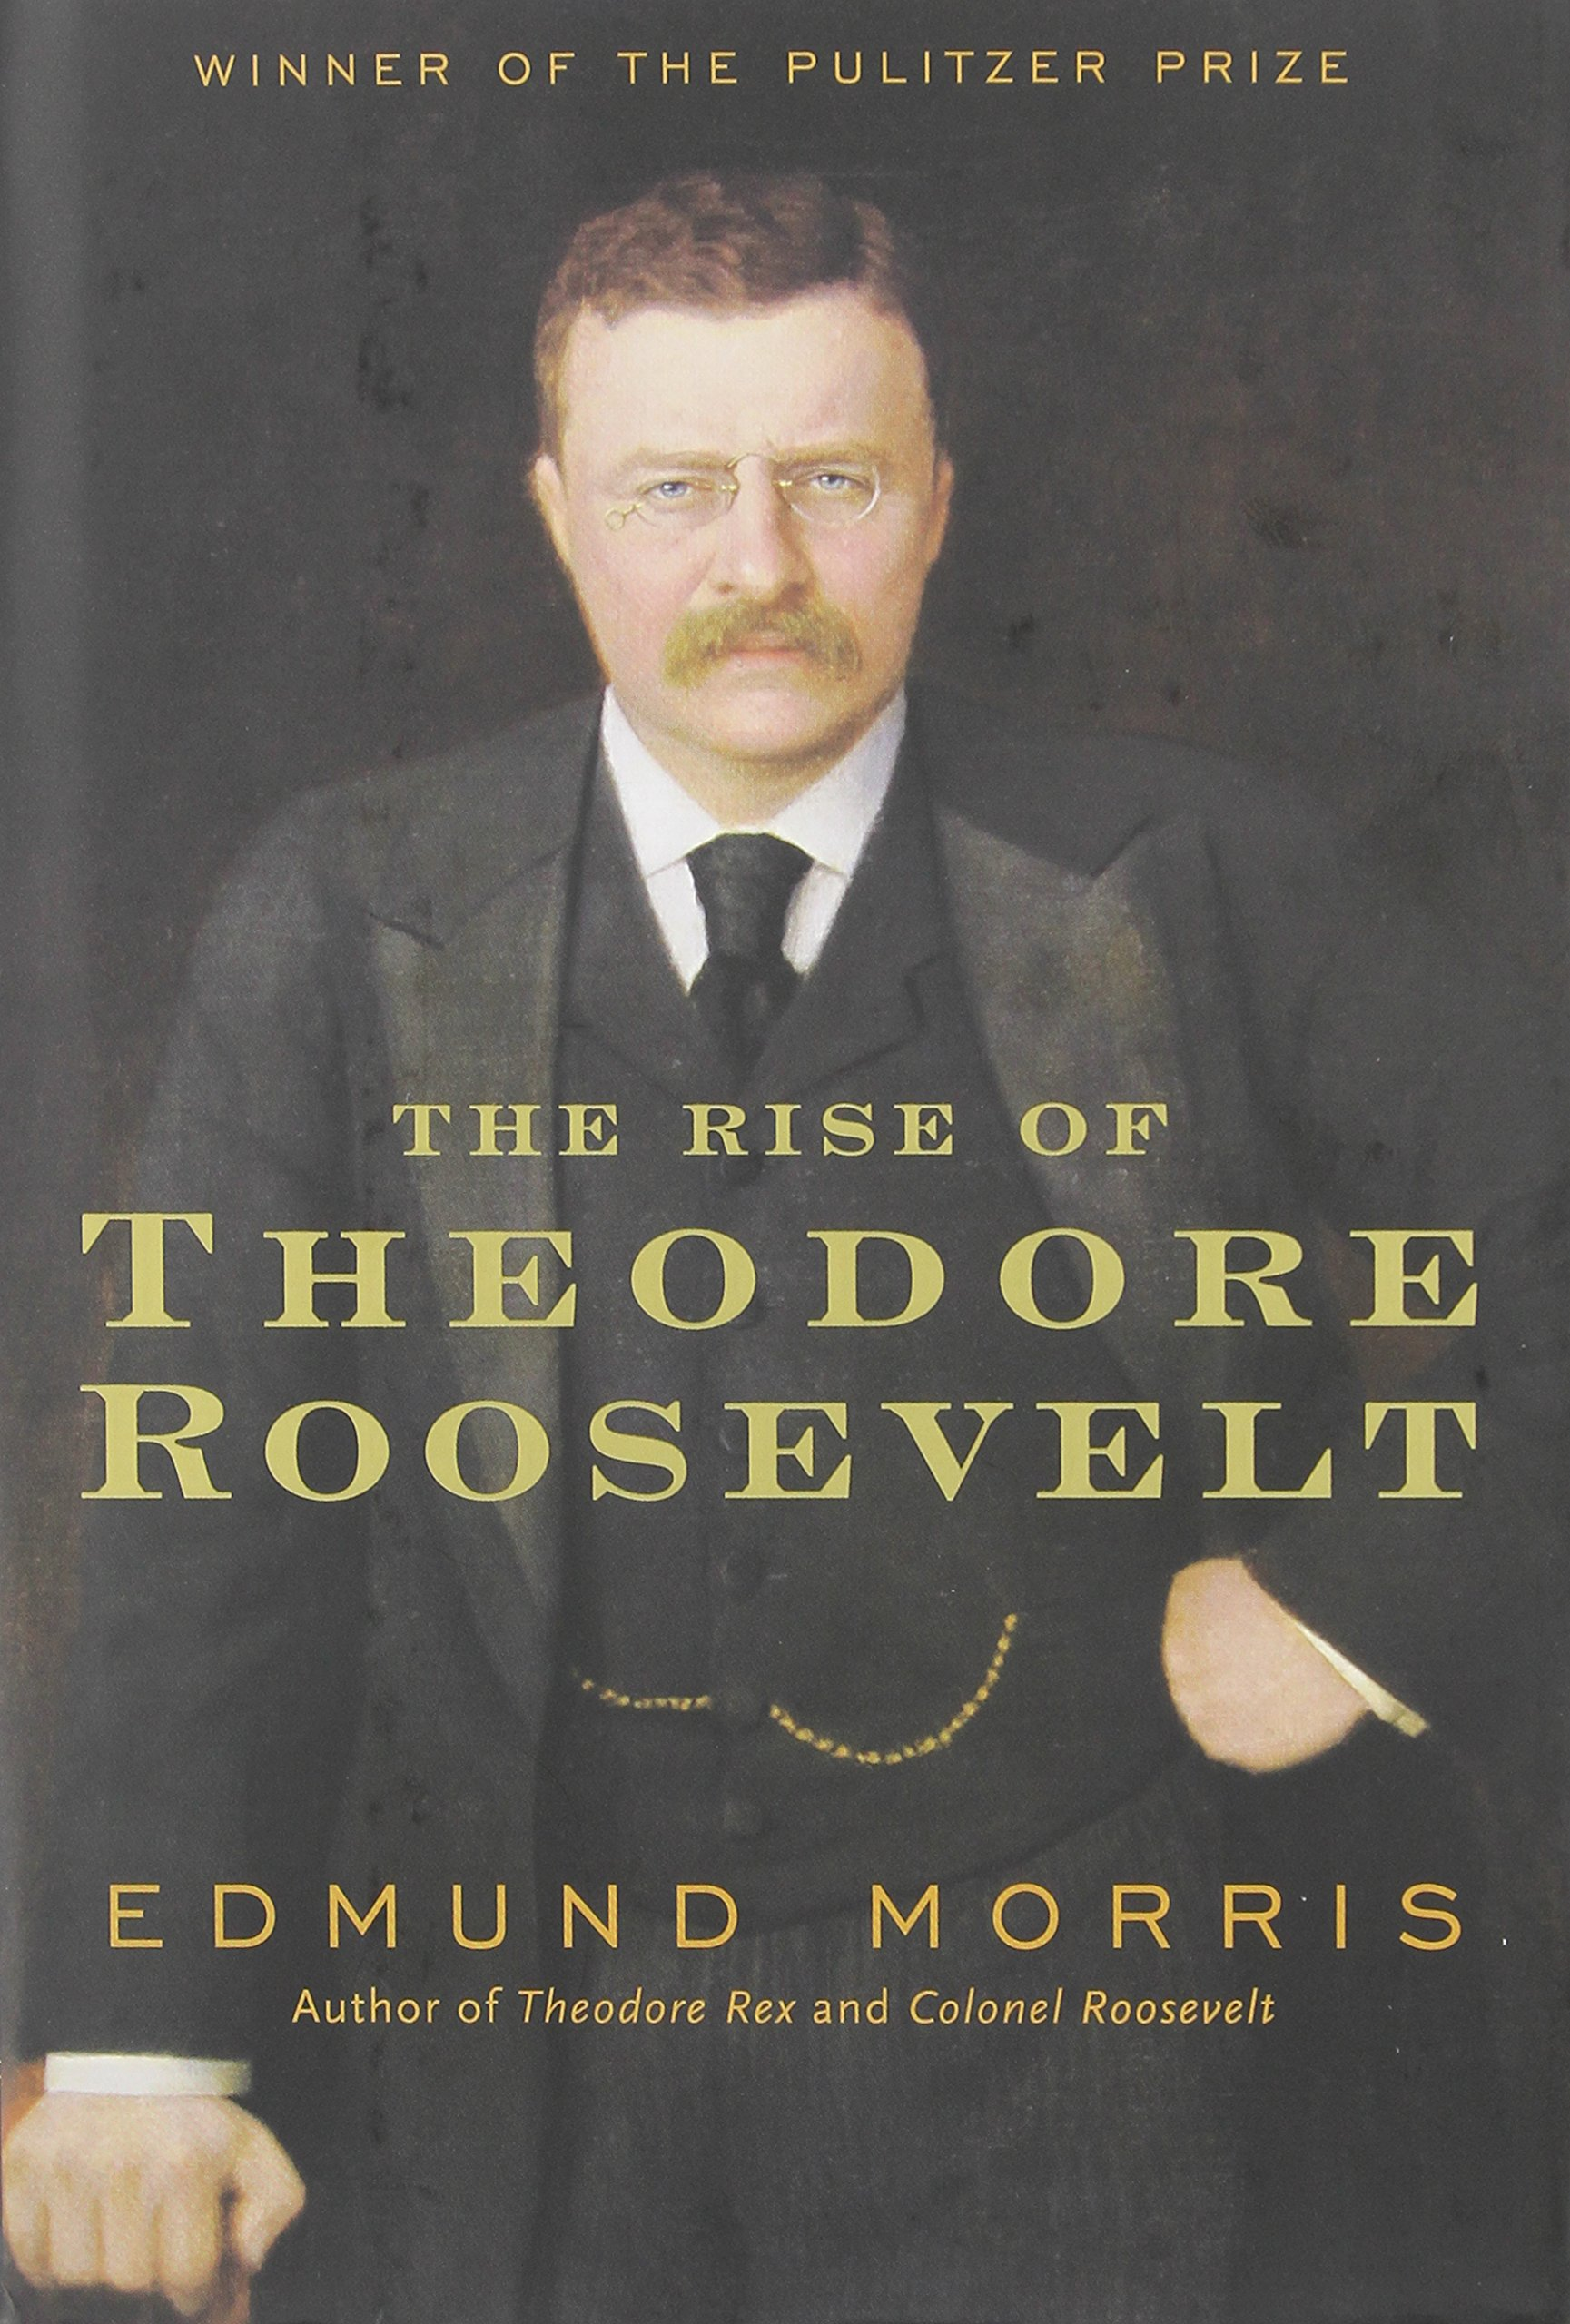 Amazon.com: Edmund Morris's Theodore Roosevelt Trilogy Bundle: The Rise of Theodore Roosevelt, Theodore Rex, and Colonel Roosevelt (9780812958638): Edmund ...